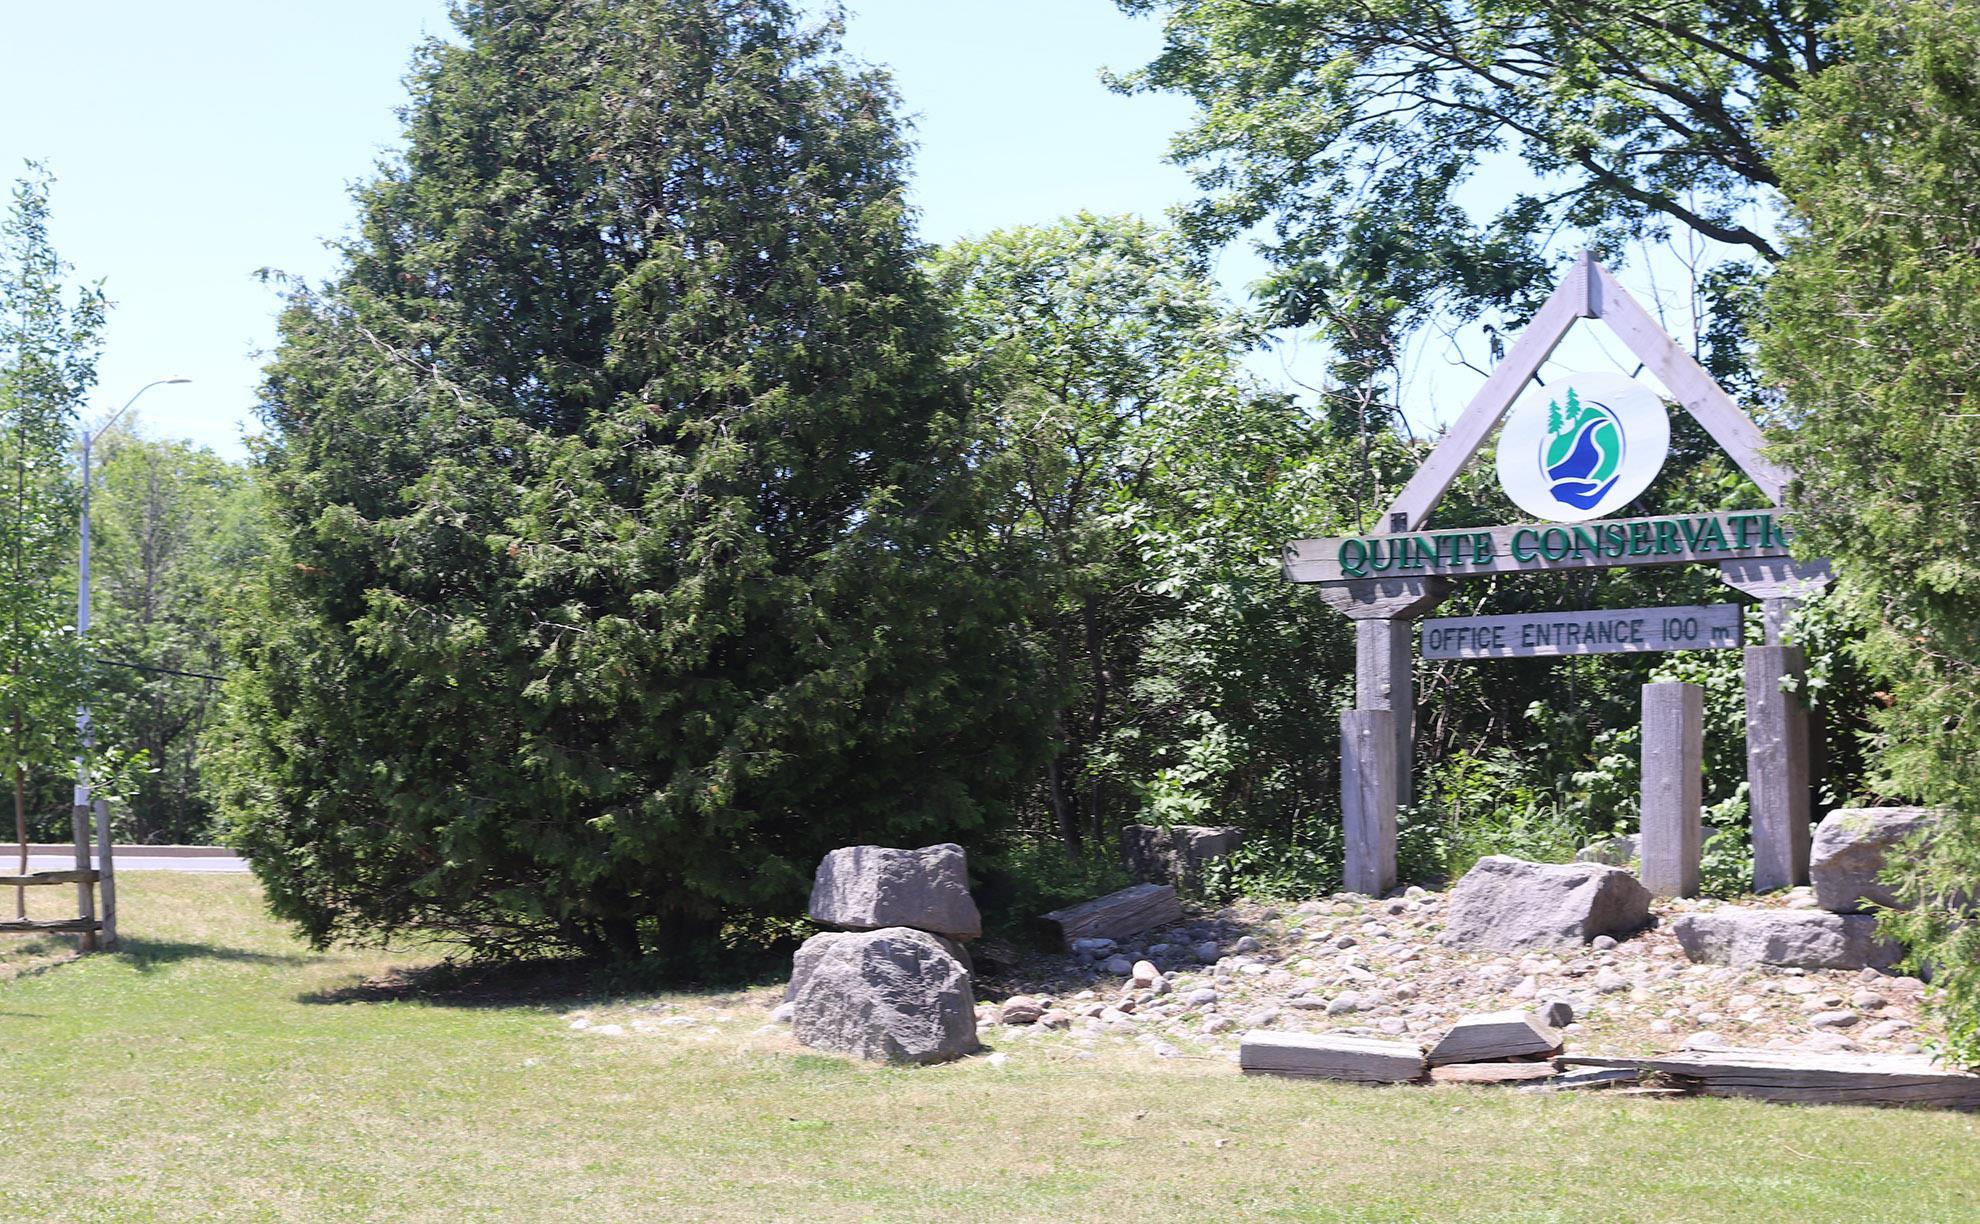 Quinter Conservation Area sign near entrance